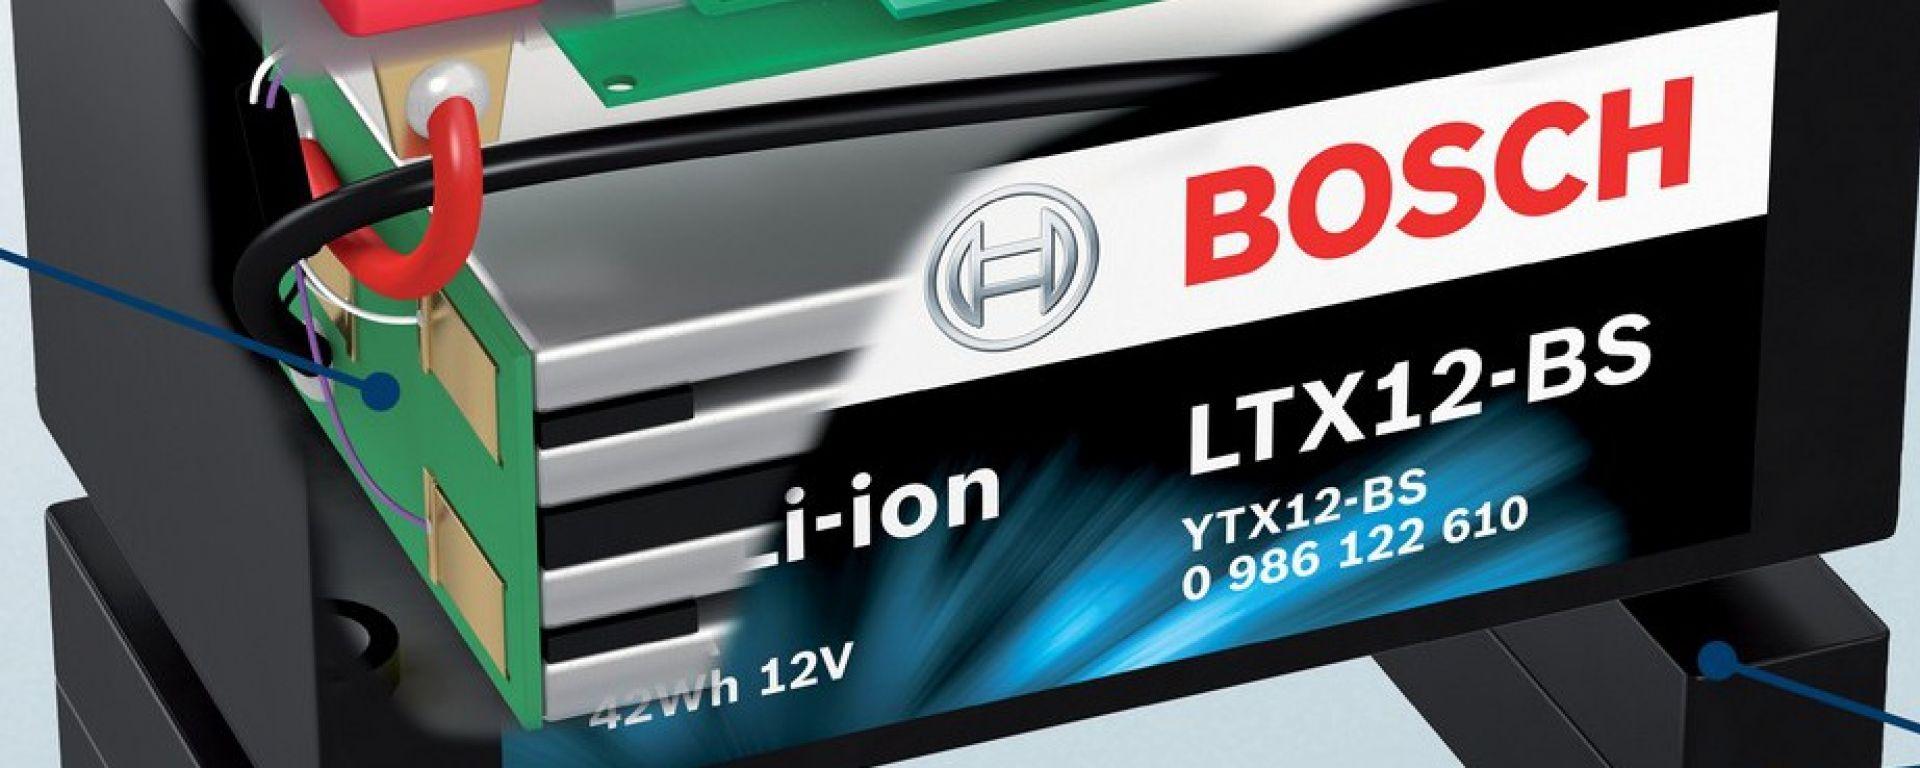 Bosch M Li-ion